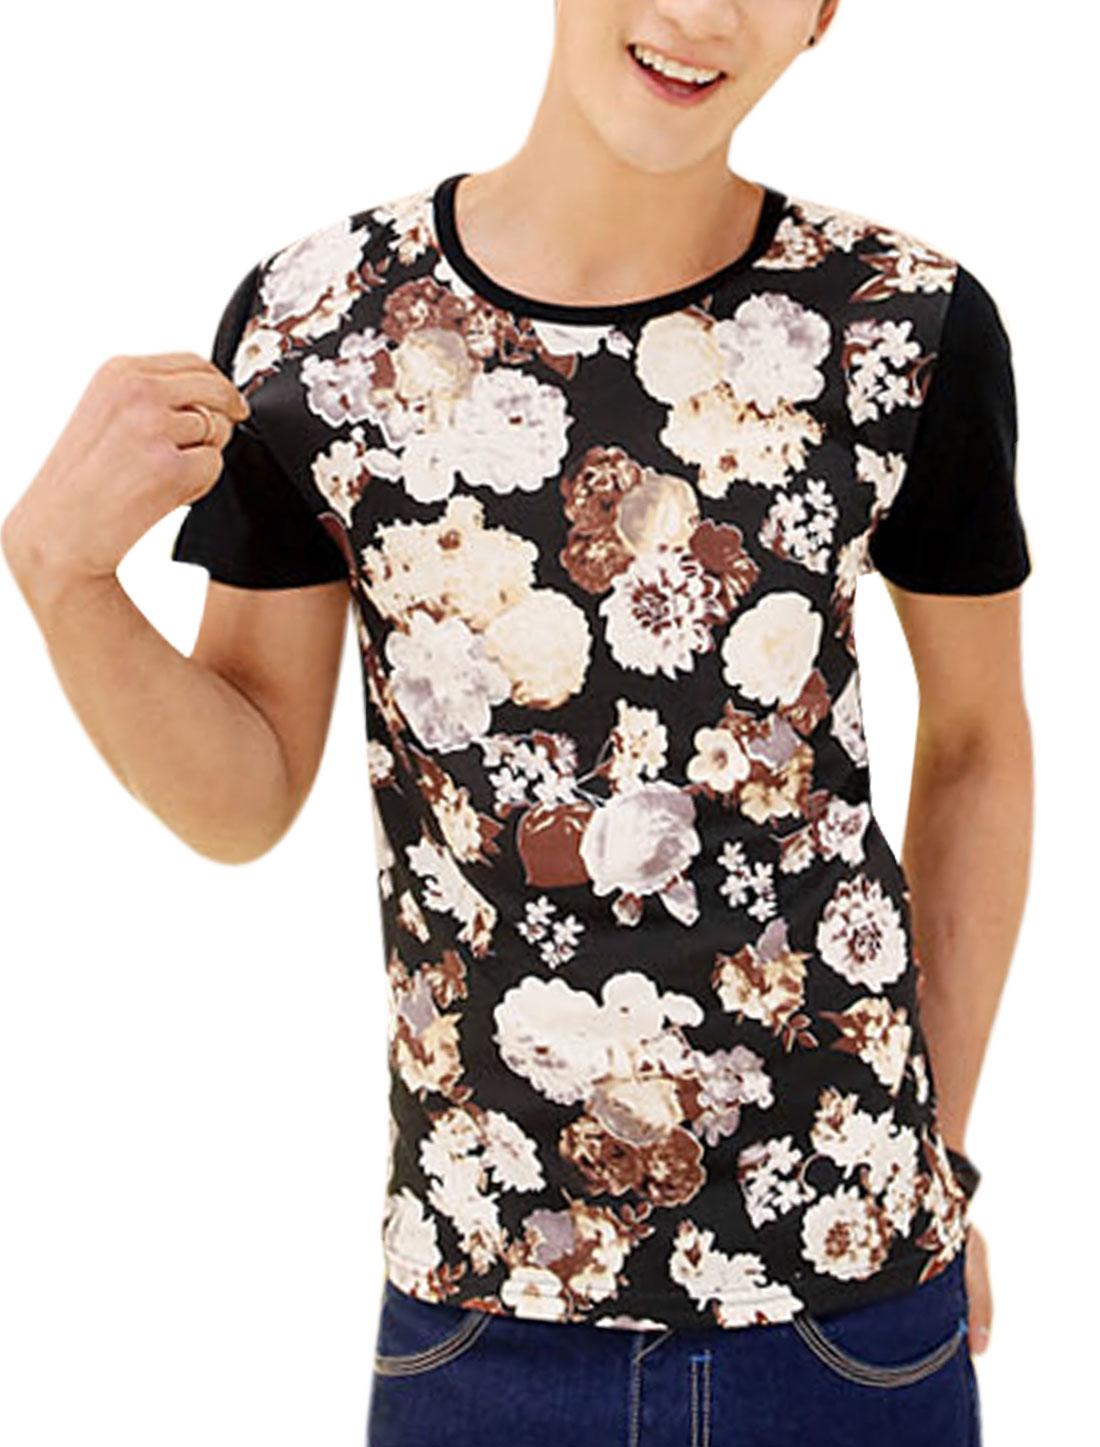 Men Summer Wear Round Neck Short Sleeve Floral Print T-Shirt Black M